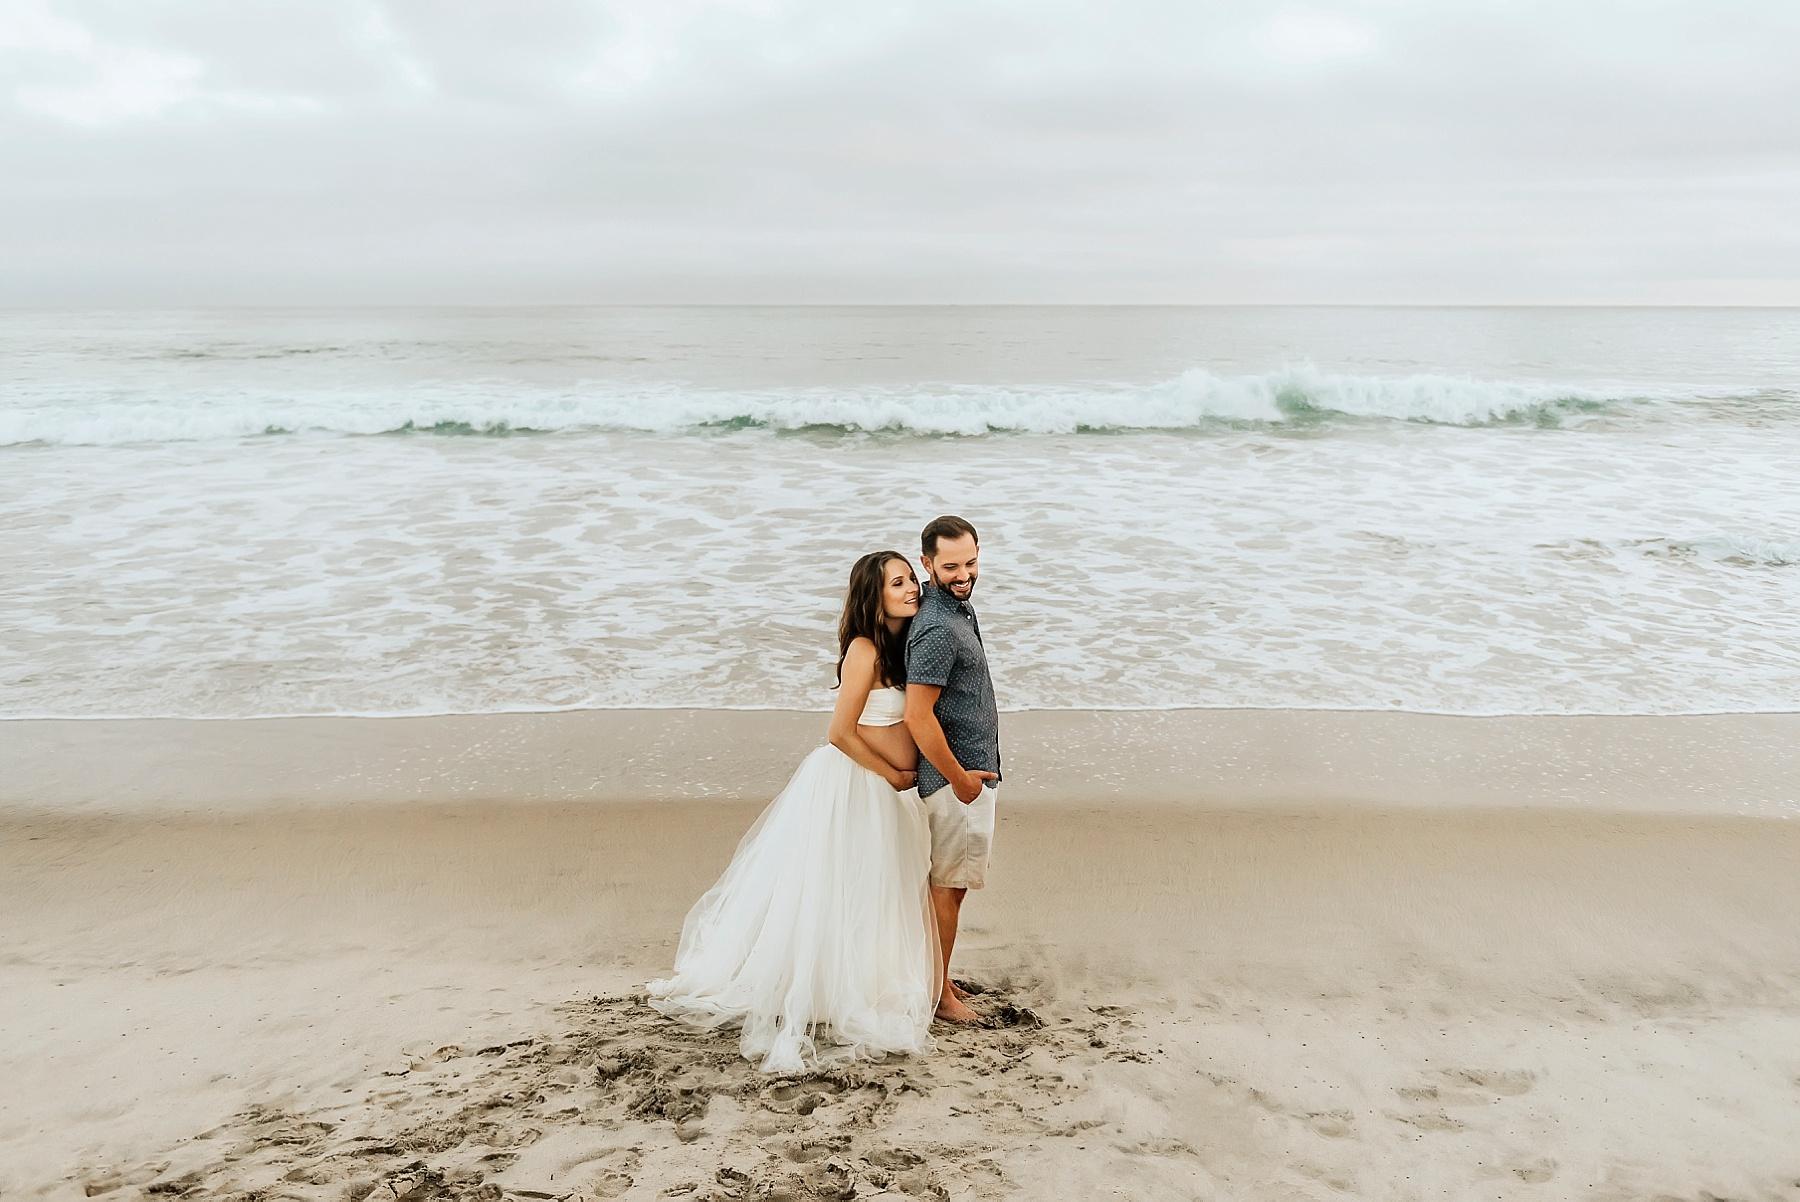 beach pregnancy photo shoot couple pose